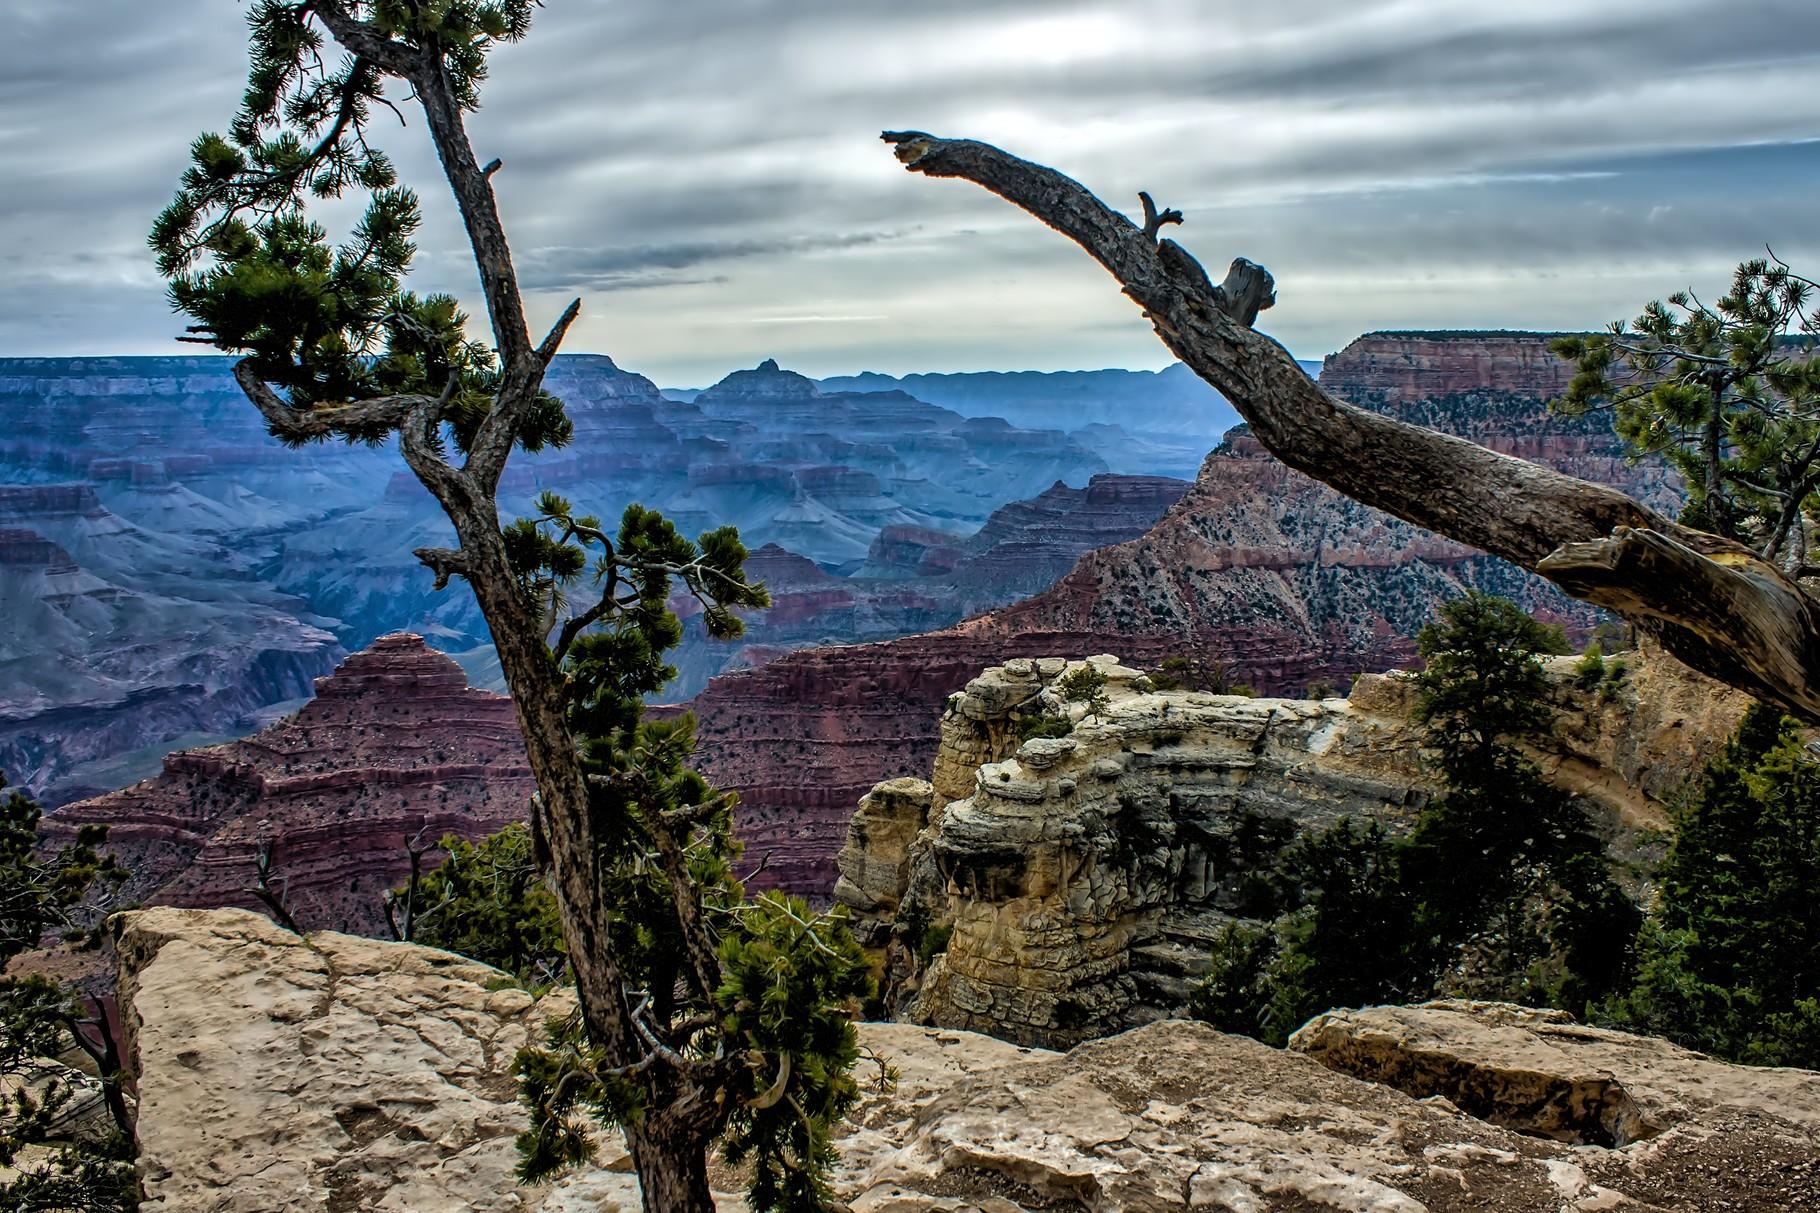 16_Grand Canyon (South Rim) in Arizona